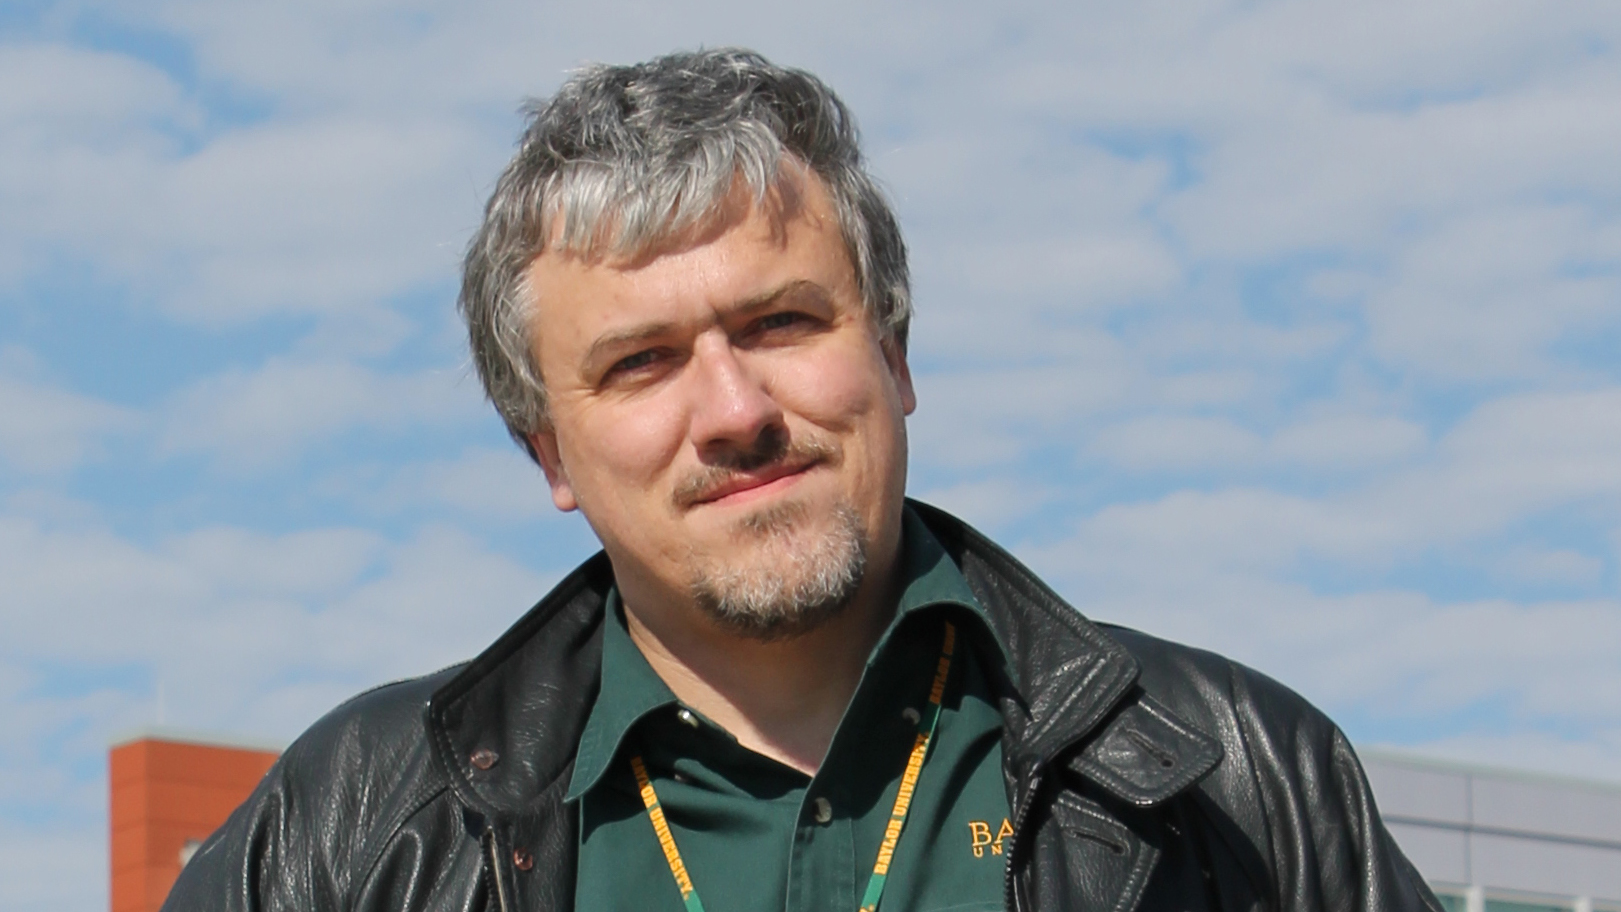 Dr. Rene Laufer